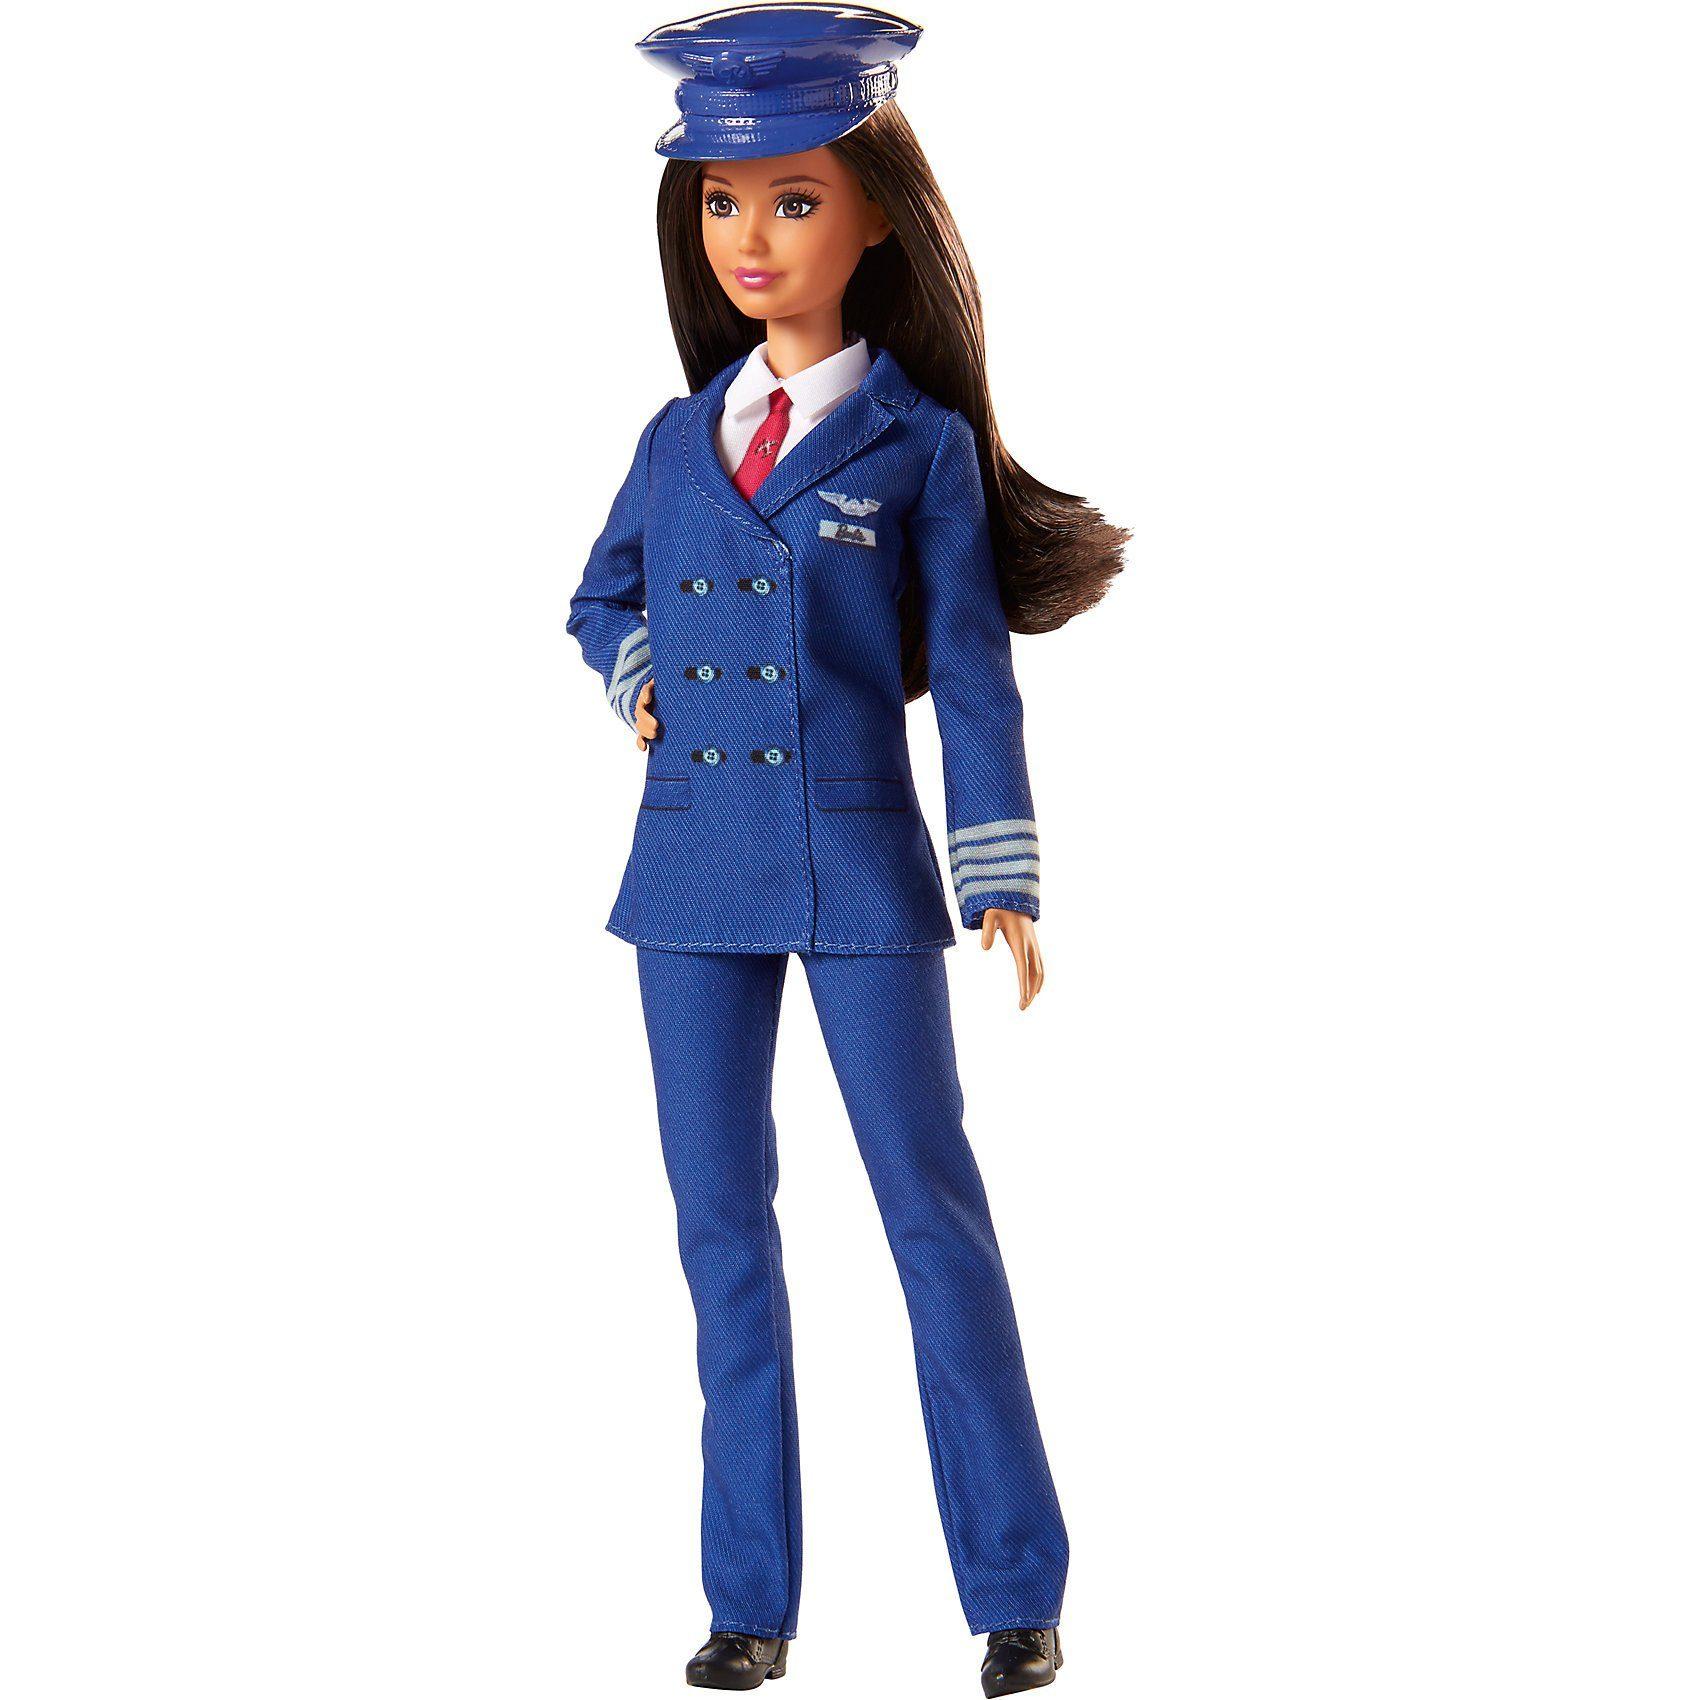 Mattel Barbie Pilotin Puppe